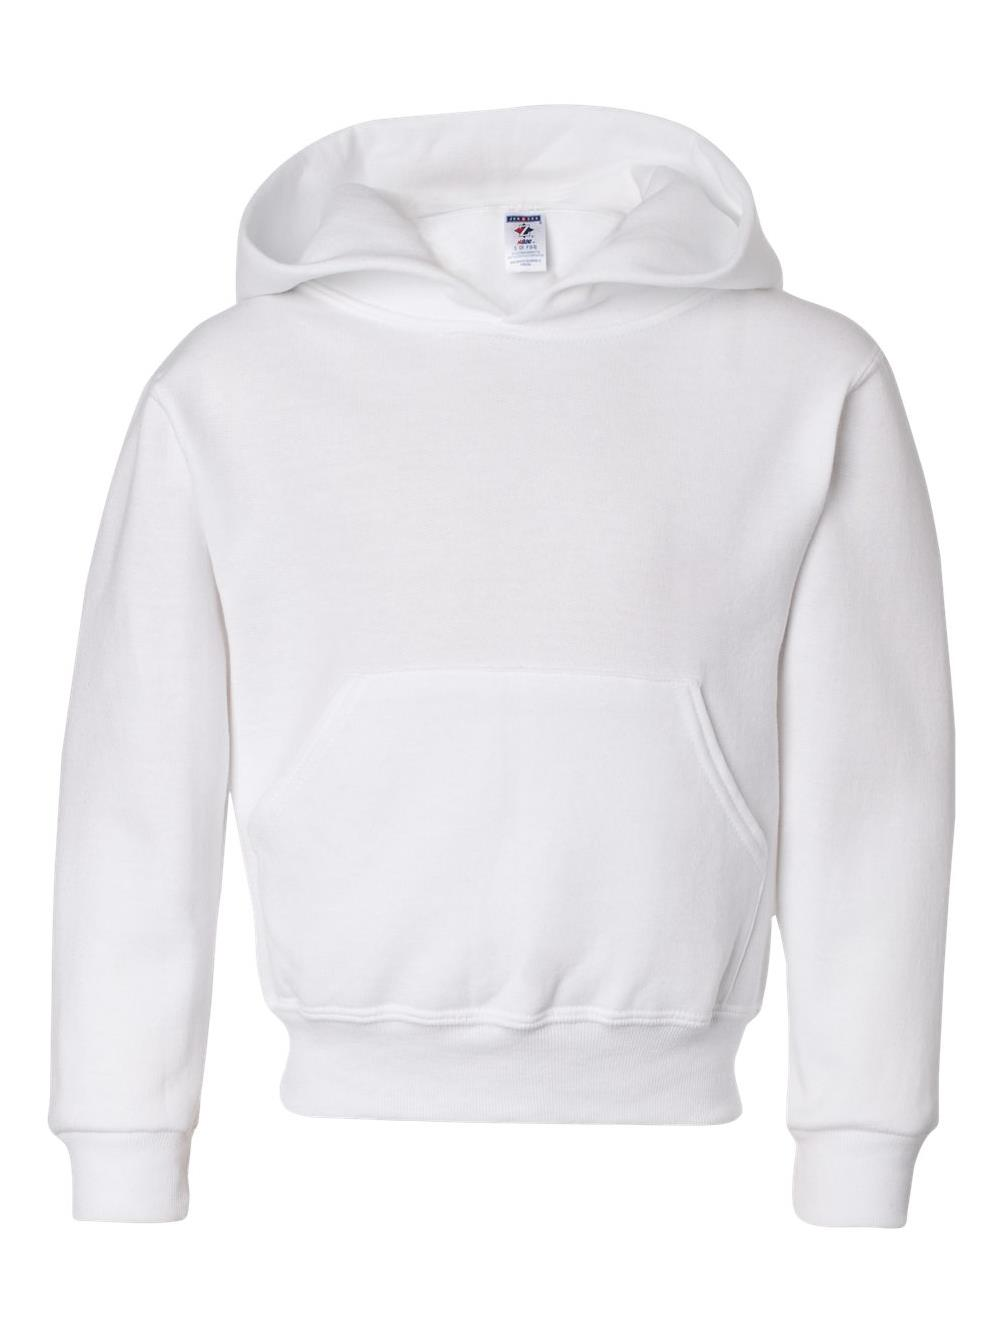 Jerzees Fleece NuBlend Youth Hooded Sweatshirt 996YR